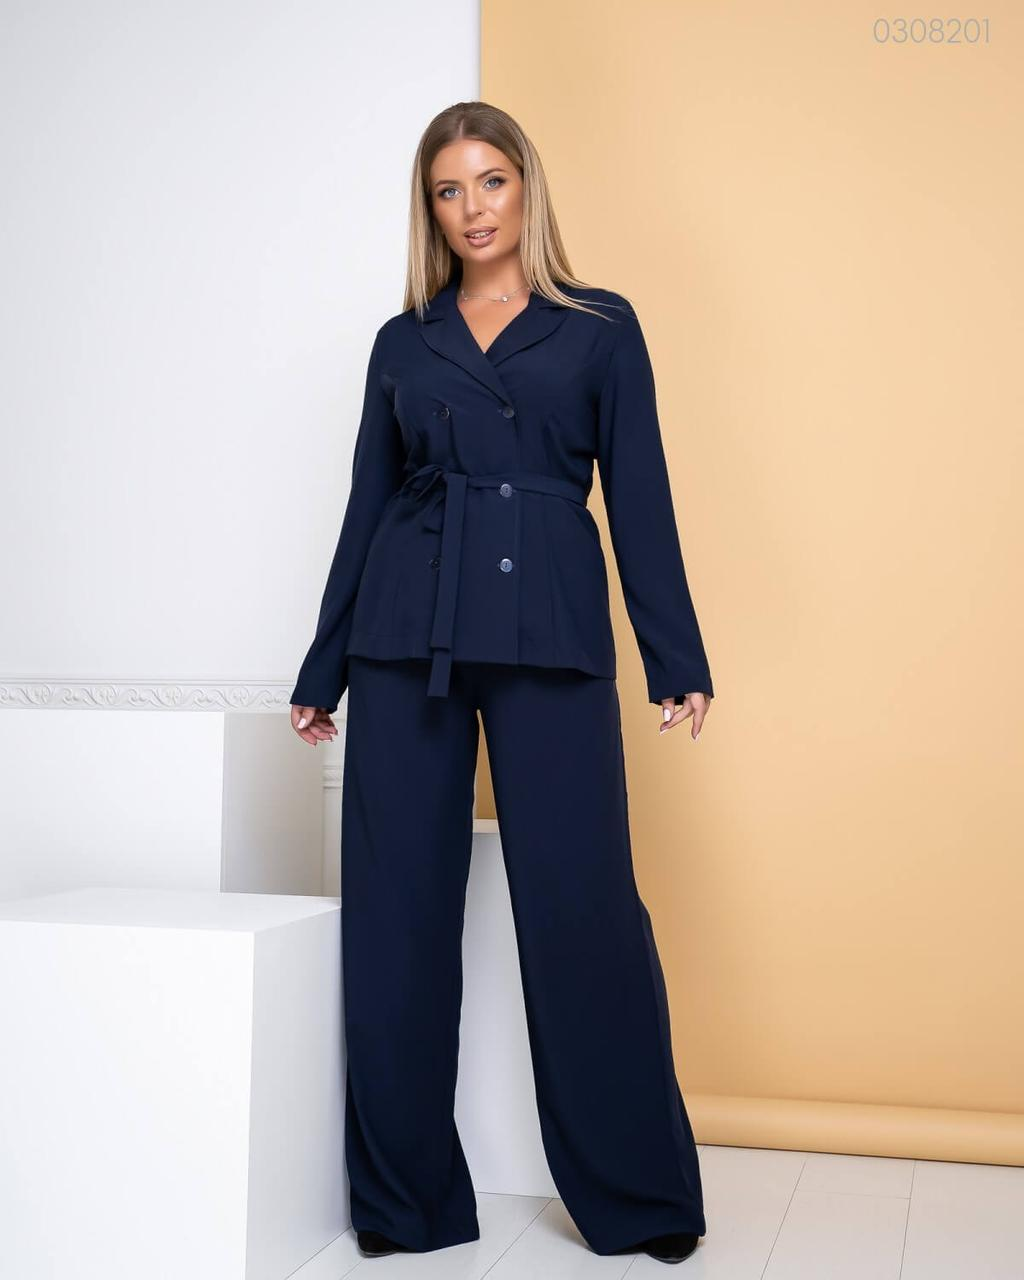 Р. 48-54 Женский деловой костюм Амстердам с широкими брюками батал (синий)